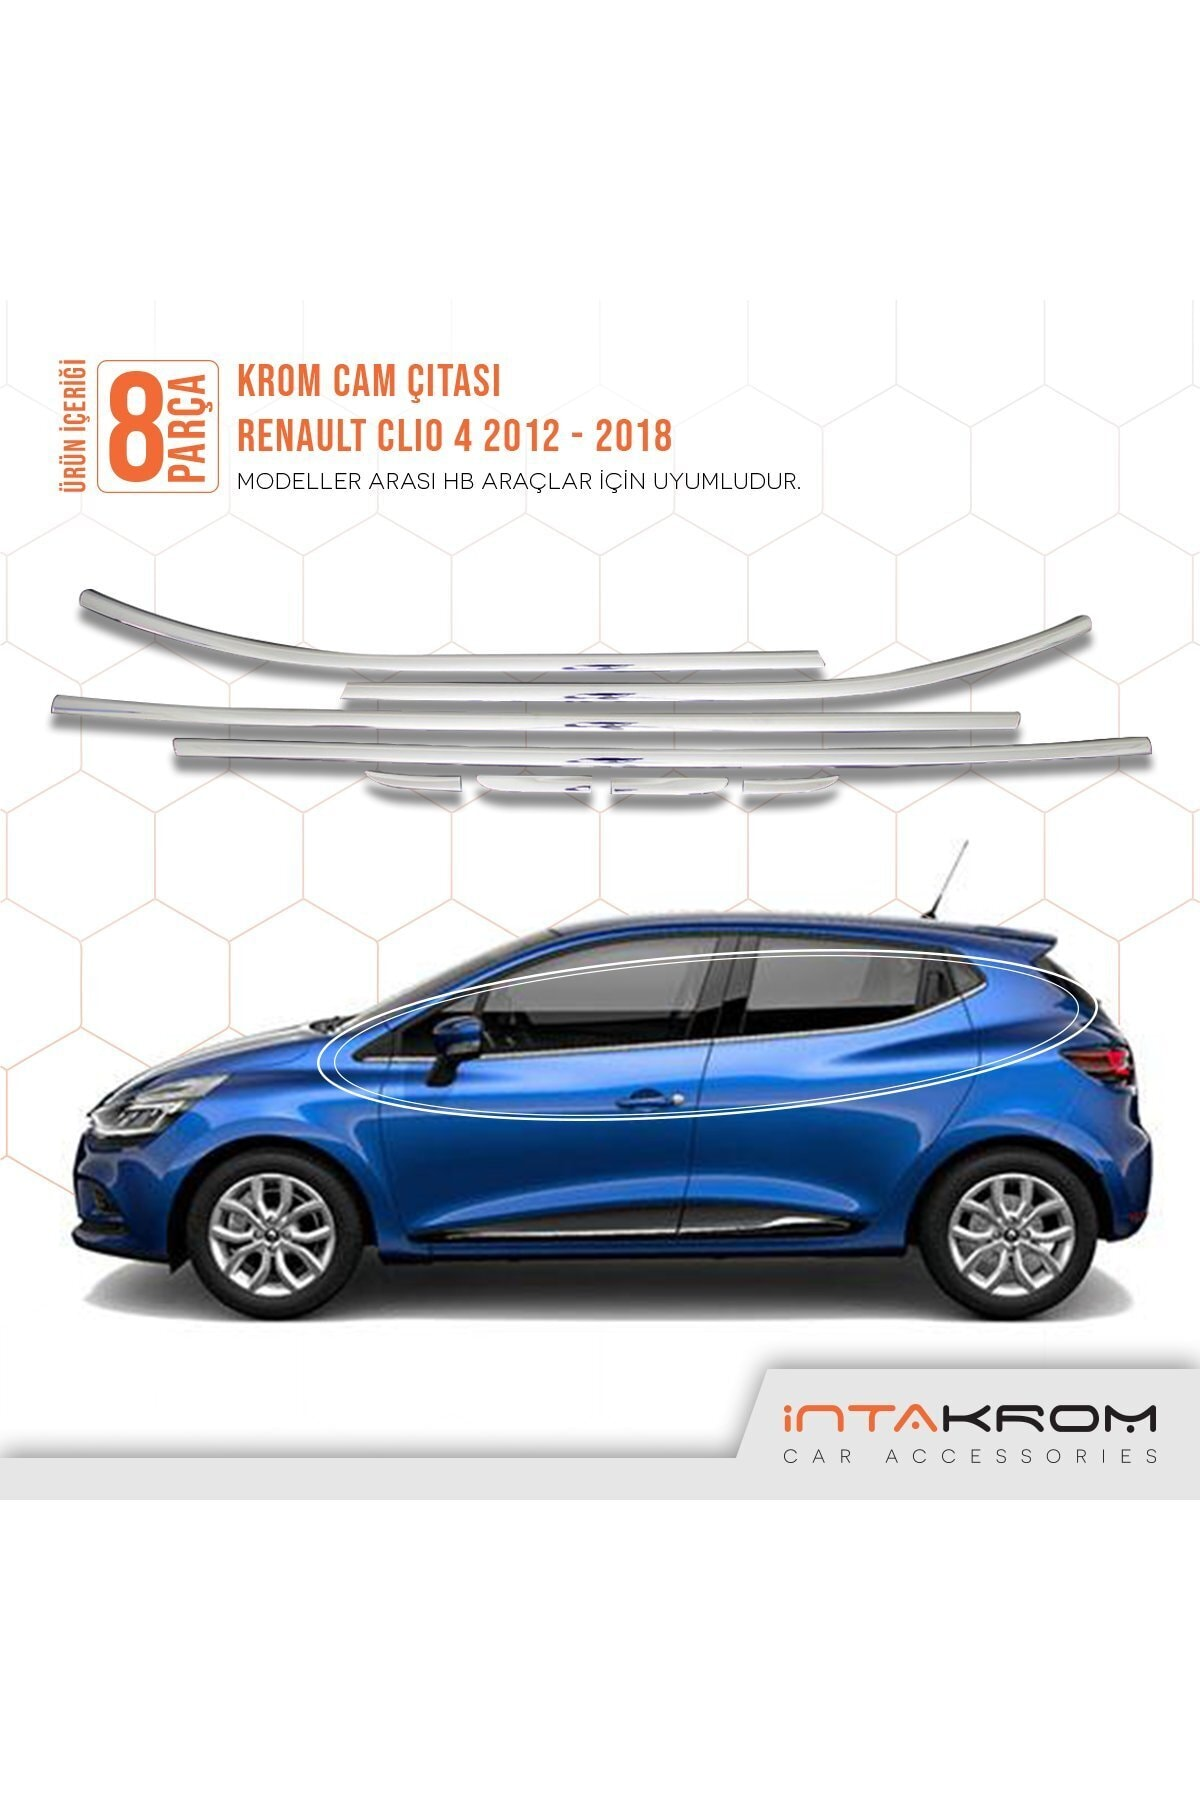 İntachrom Renault Clio 4 Krom Cam Çıtası 8 Parça 2012 -2018 / Hb 1